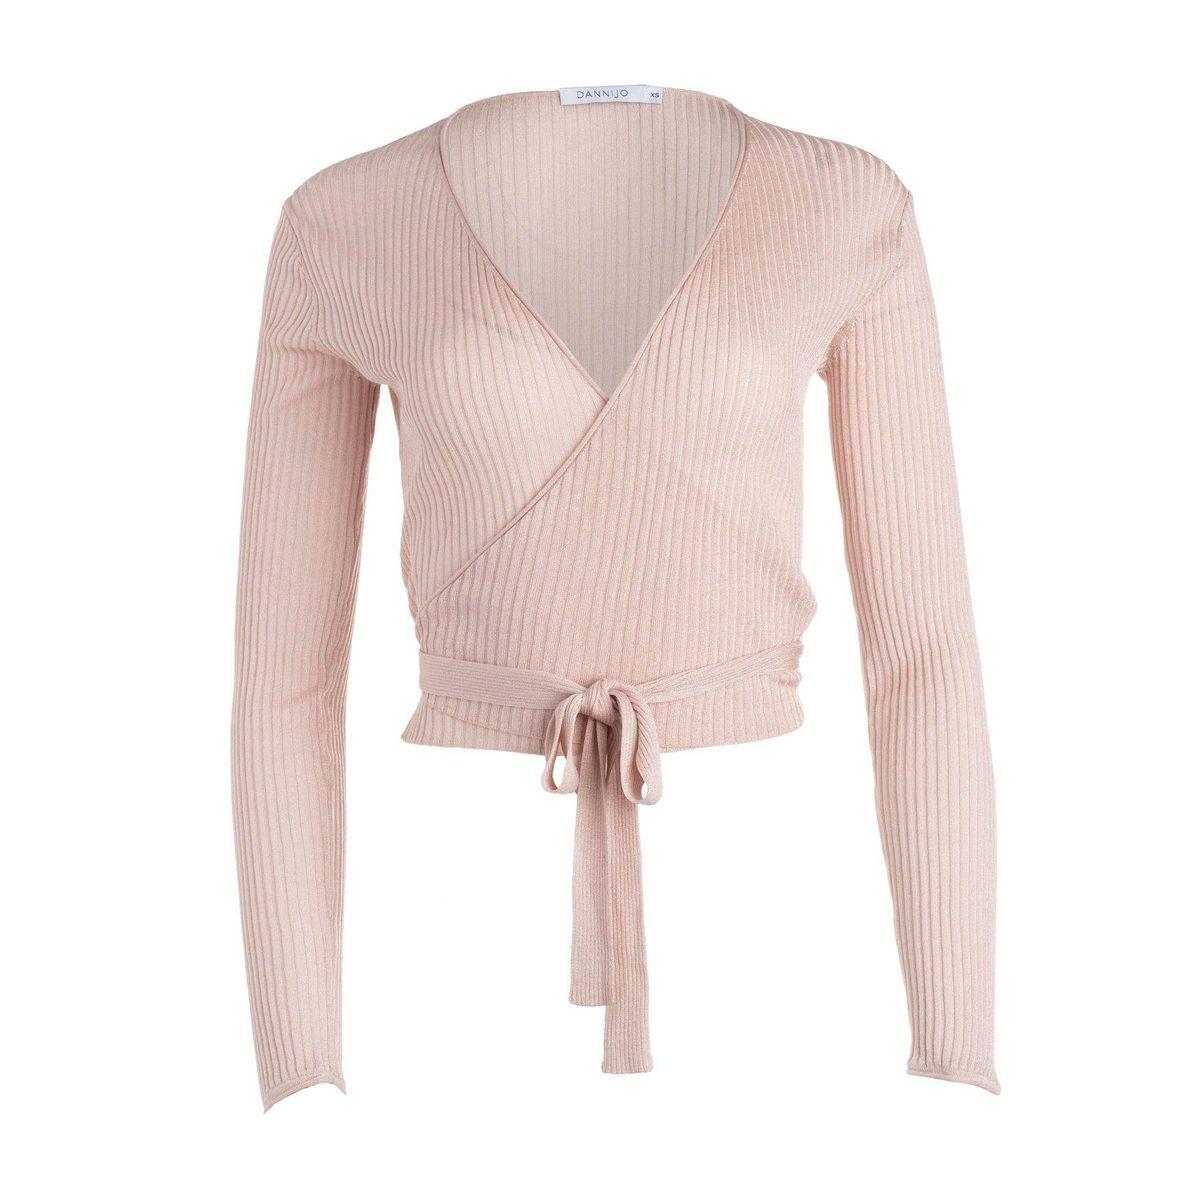 dannijo wrap ballet cardigan light pink